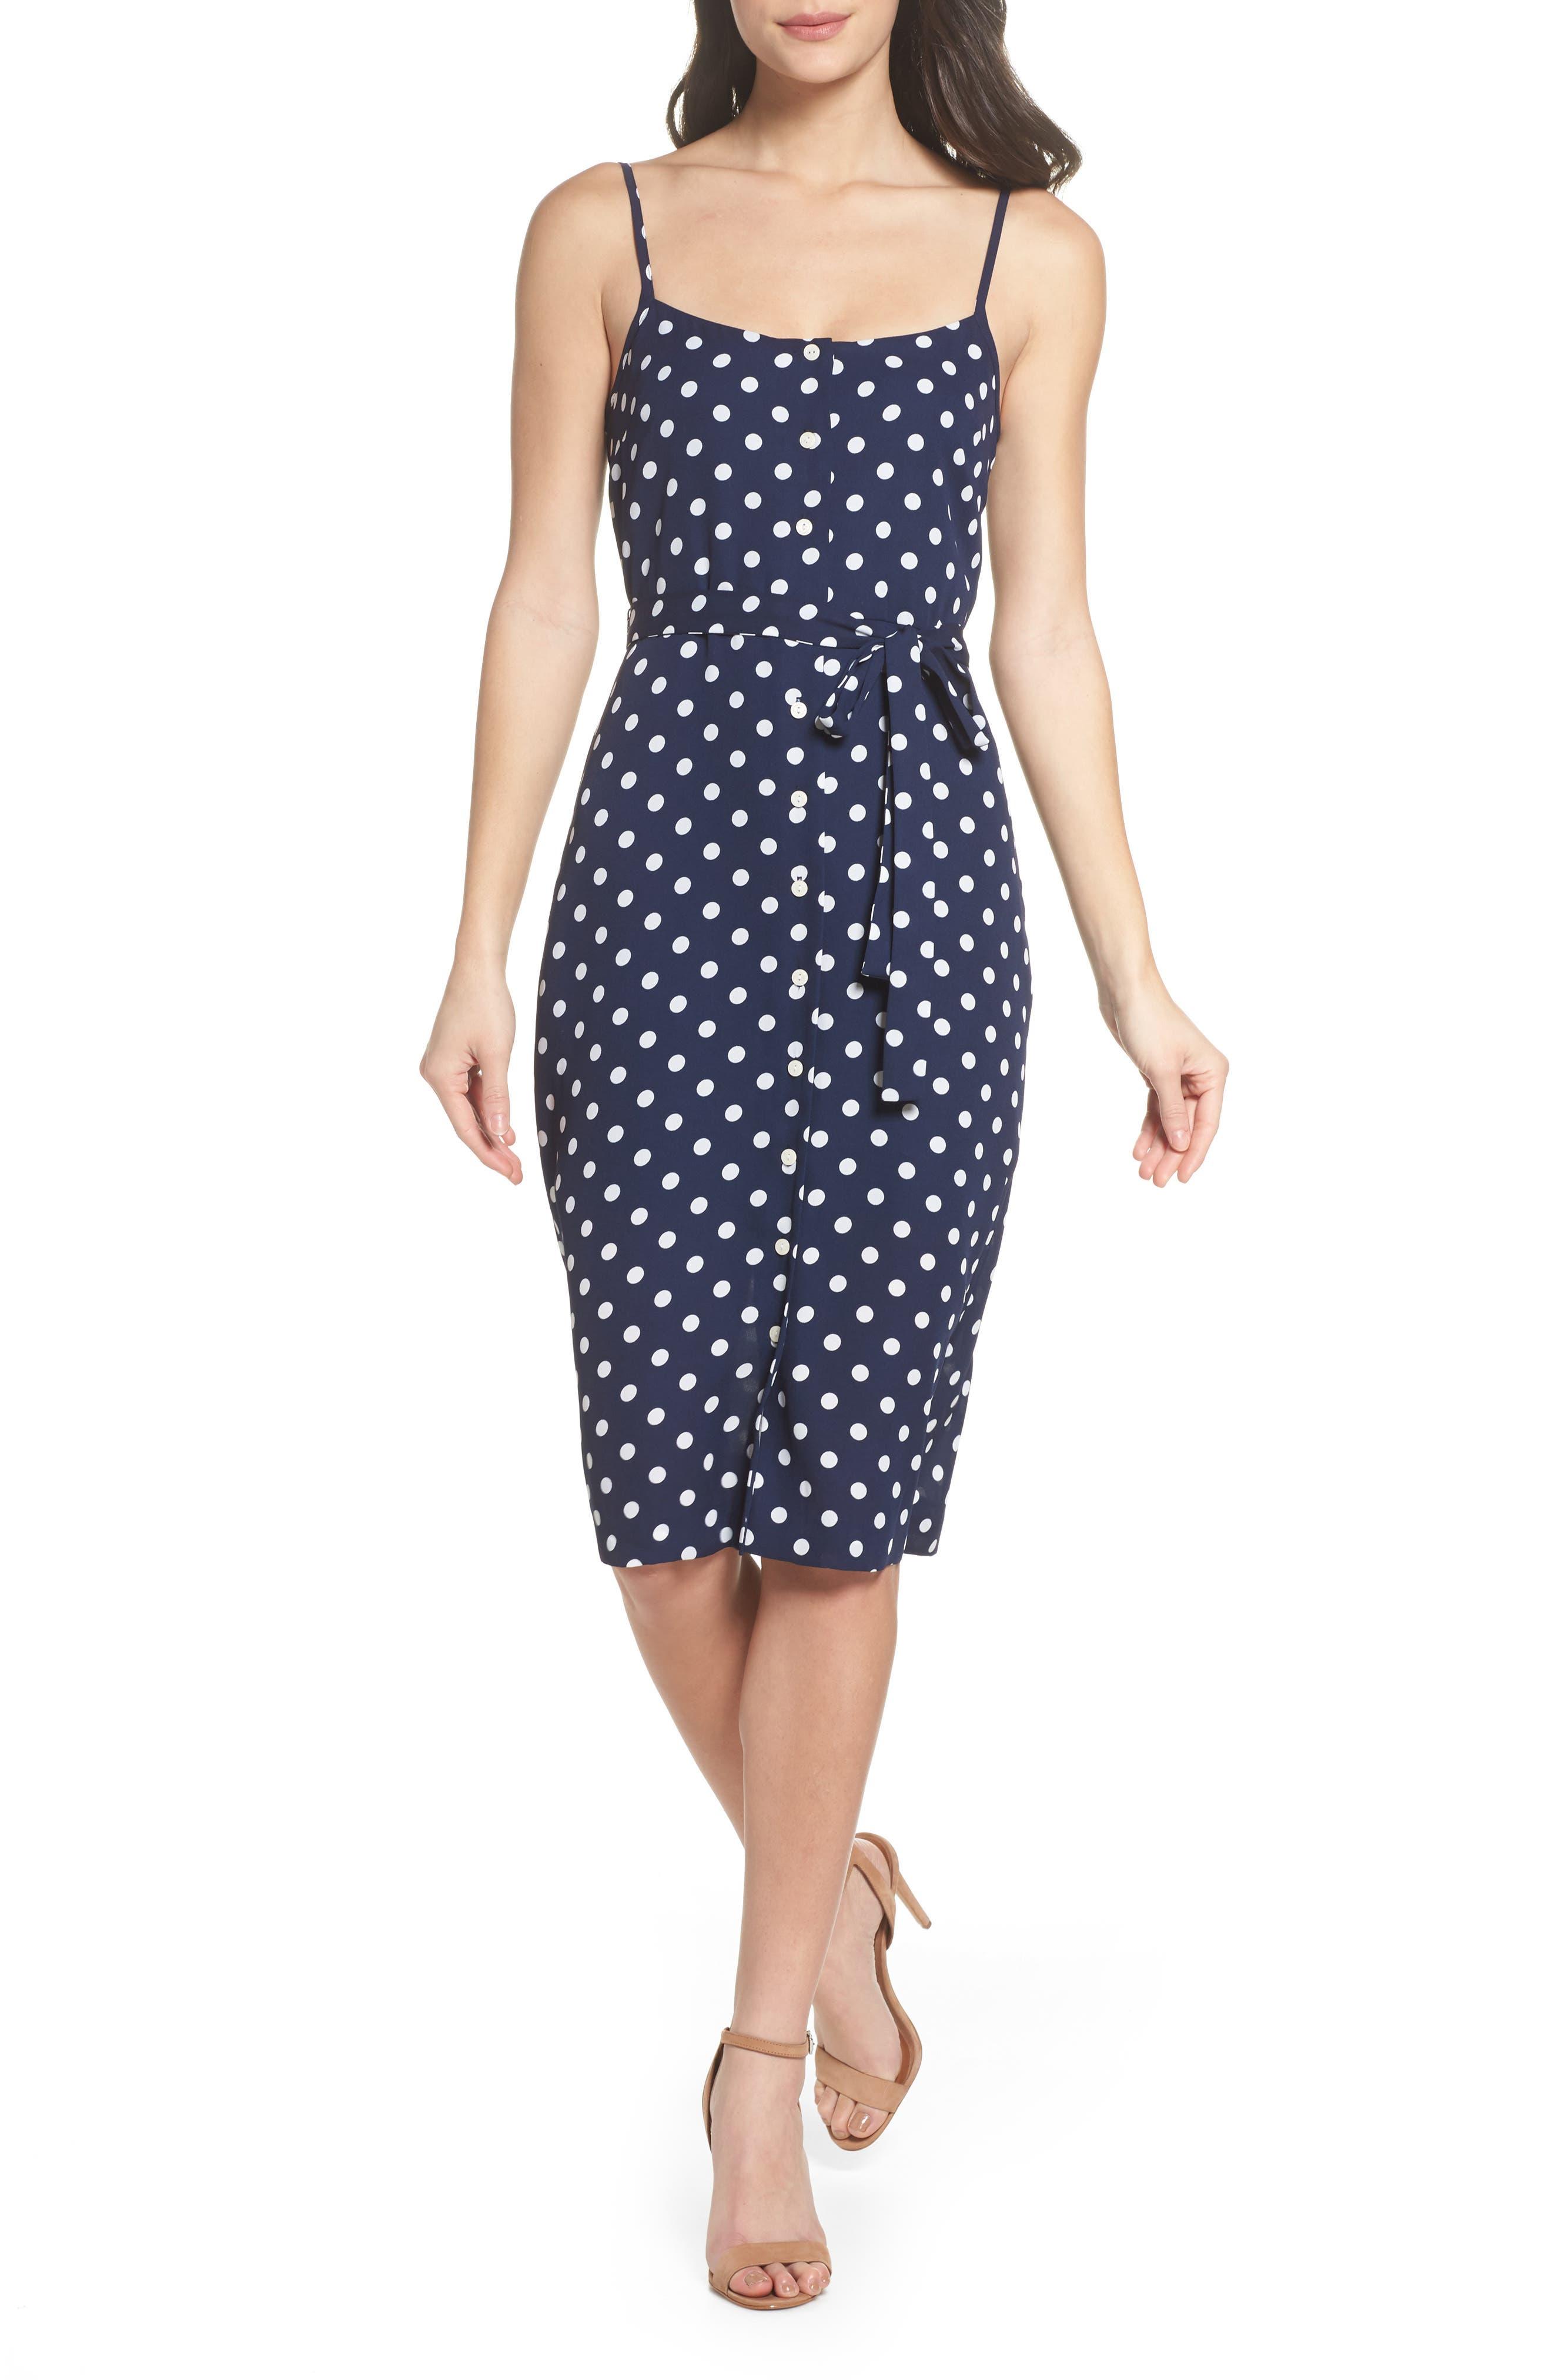 Flower Frolicking Midi Dress,                         Main,                         color, Navy Polka Dot